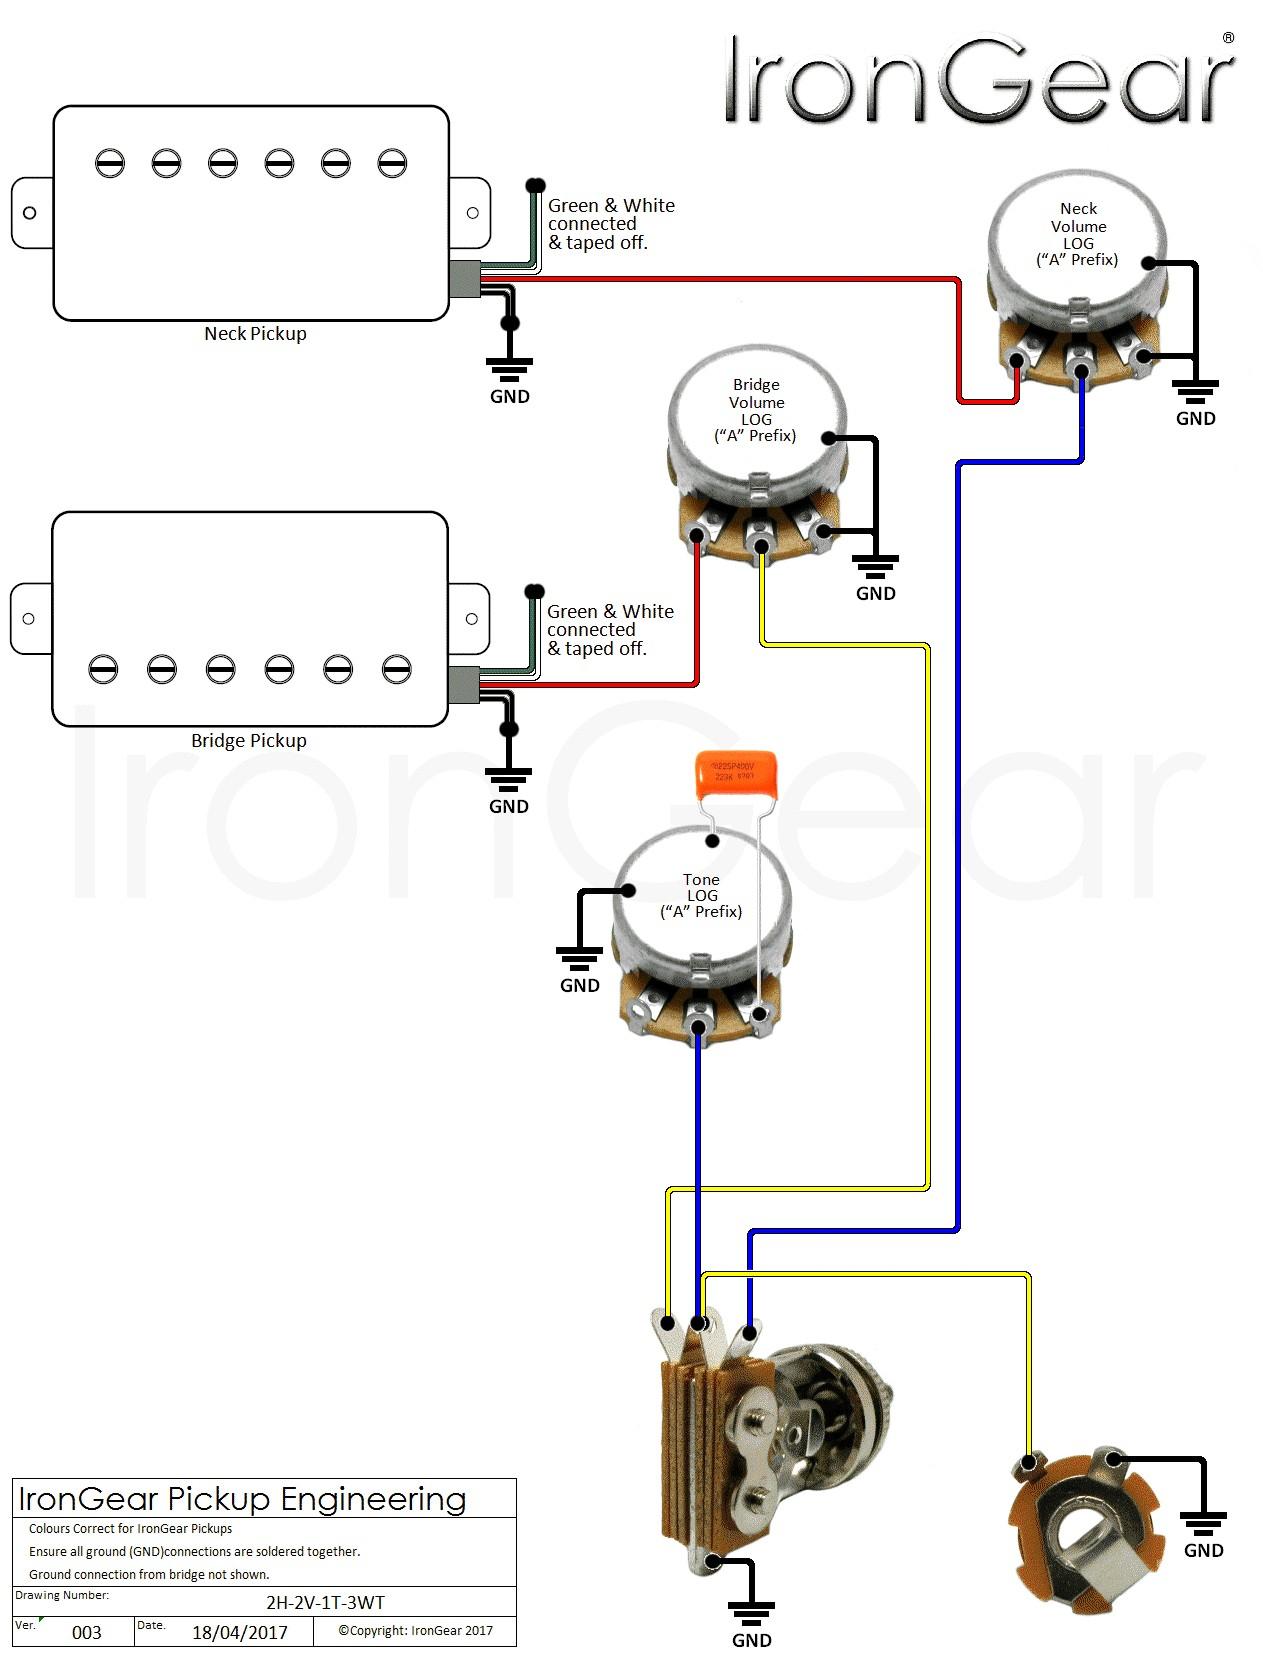 bass wiring diagram 2 volume 2 tone Download-Wiring Diagram For A Guitar Fresh Wiring Diagram Guitar 2 Volume 1 Tone X Que Blurts 5-b